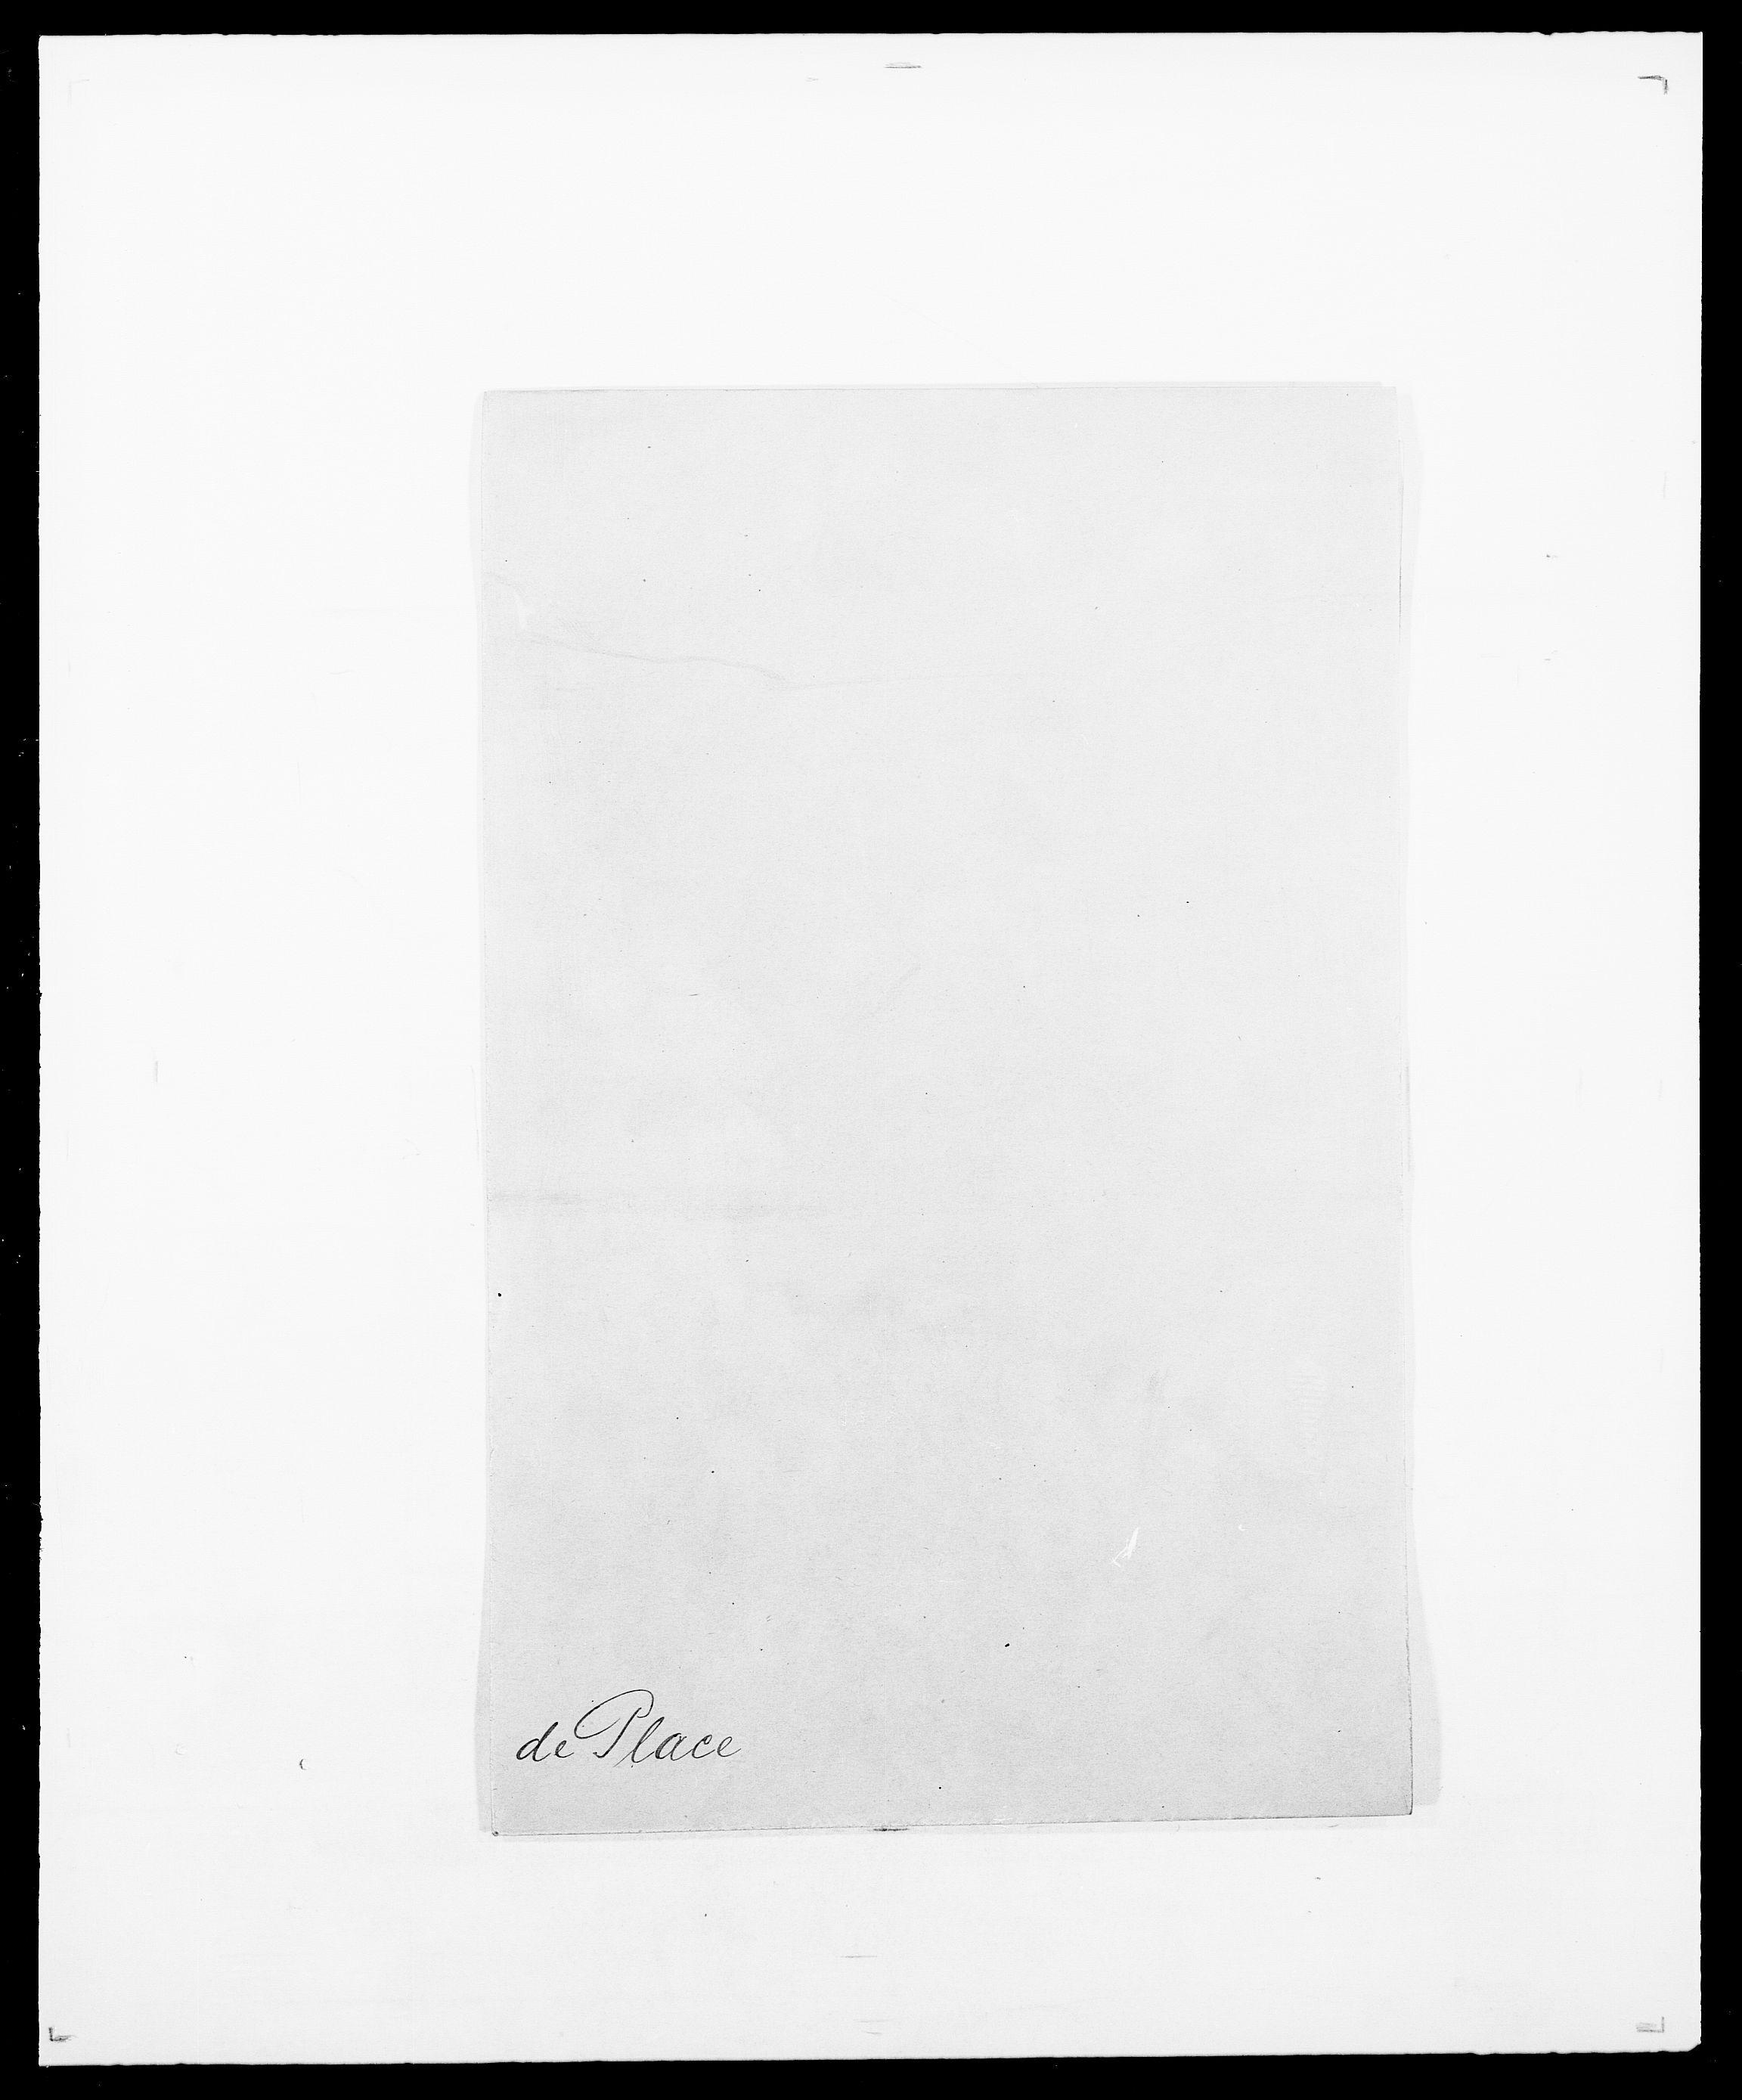 SAO, Delgobe, Charles Antoine - samling, D/Da/L0031: de Place - Raaum, s. 1